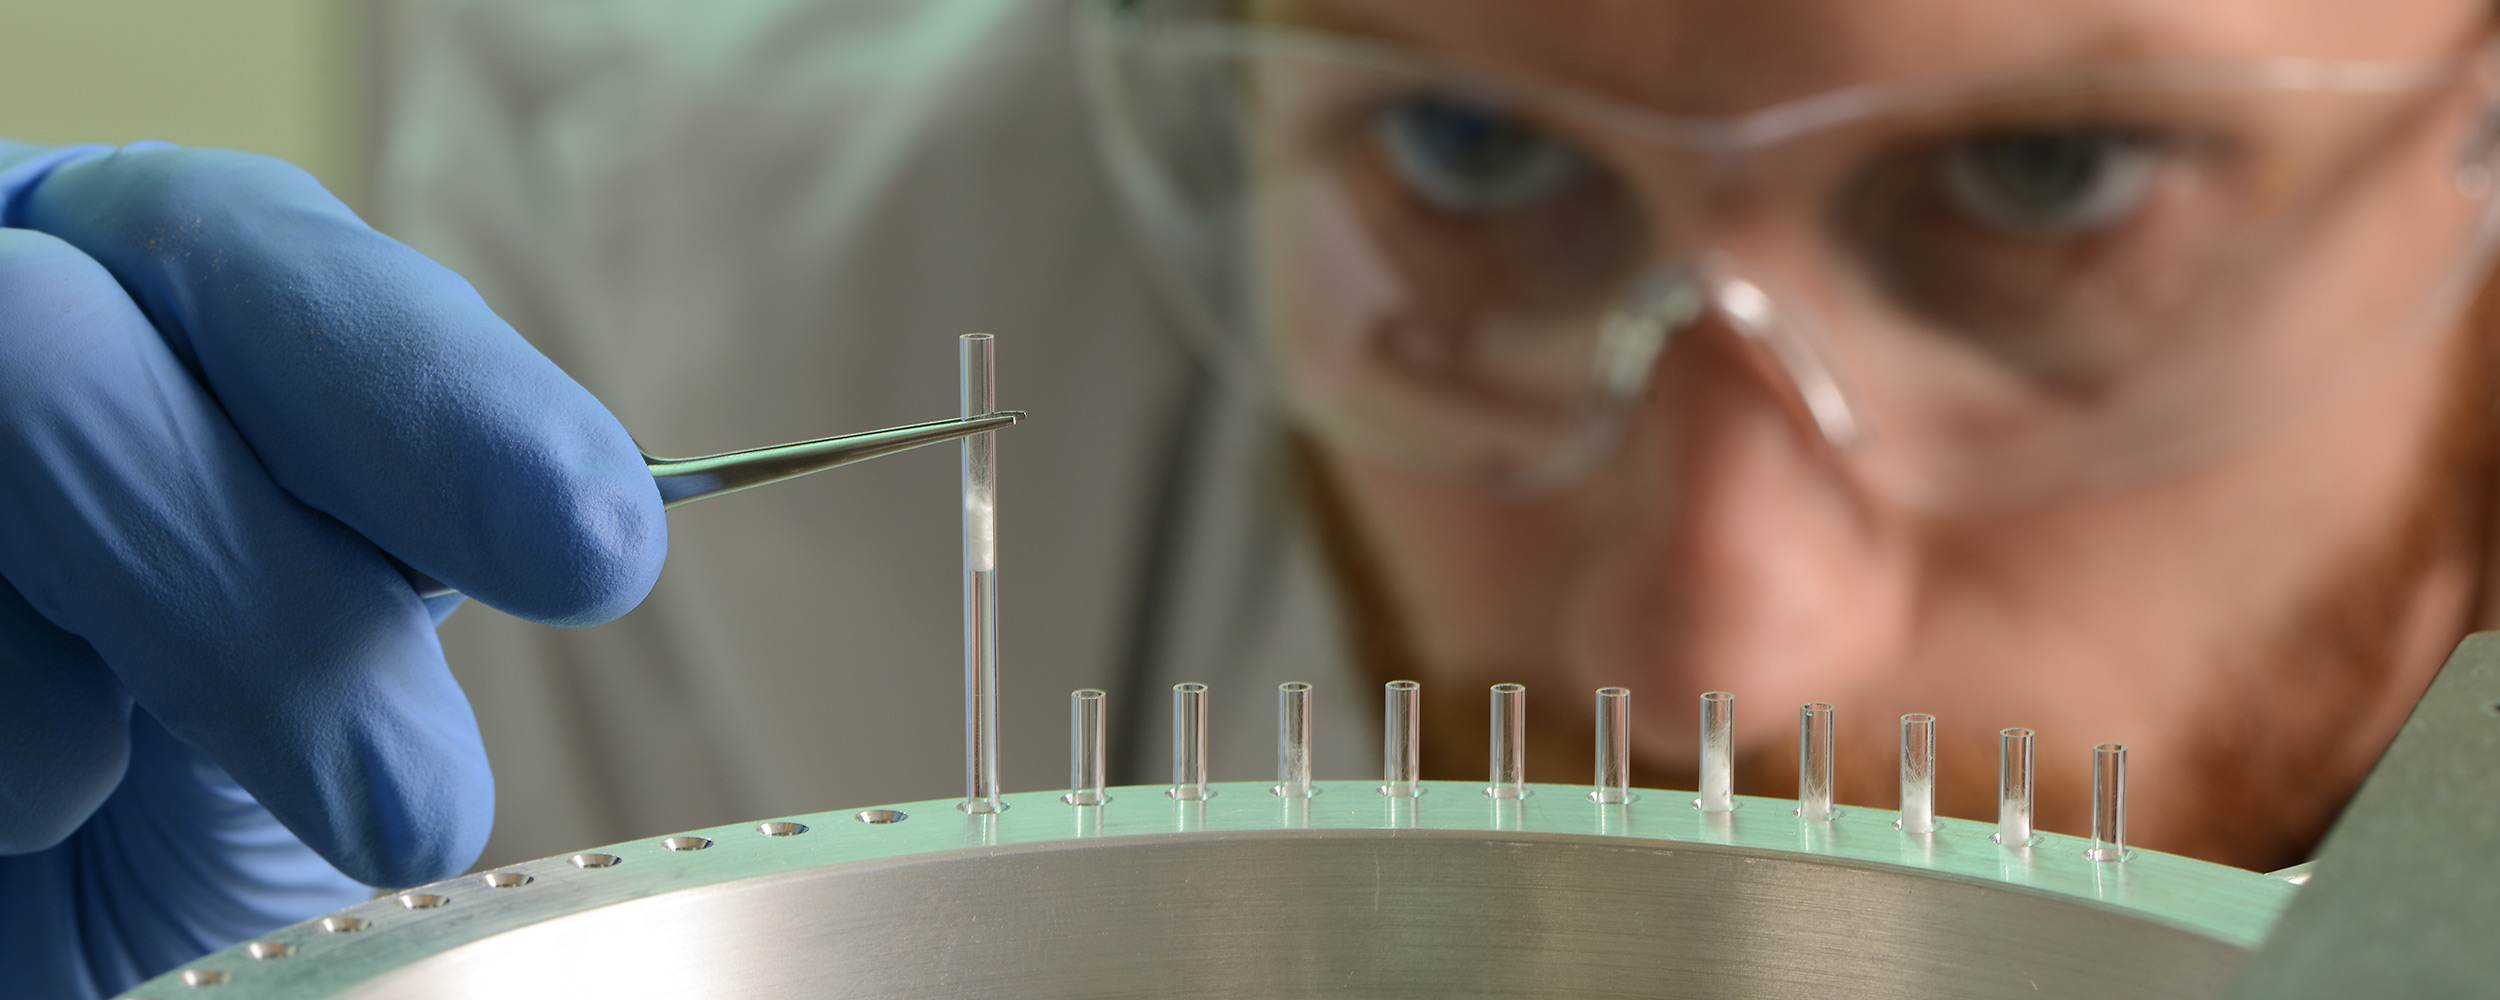 analytical chemistry and pharmaceutics